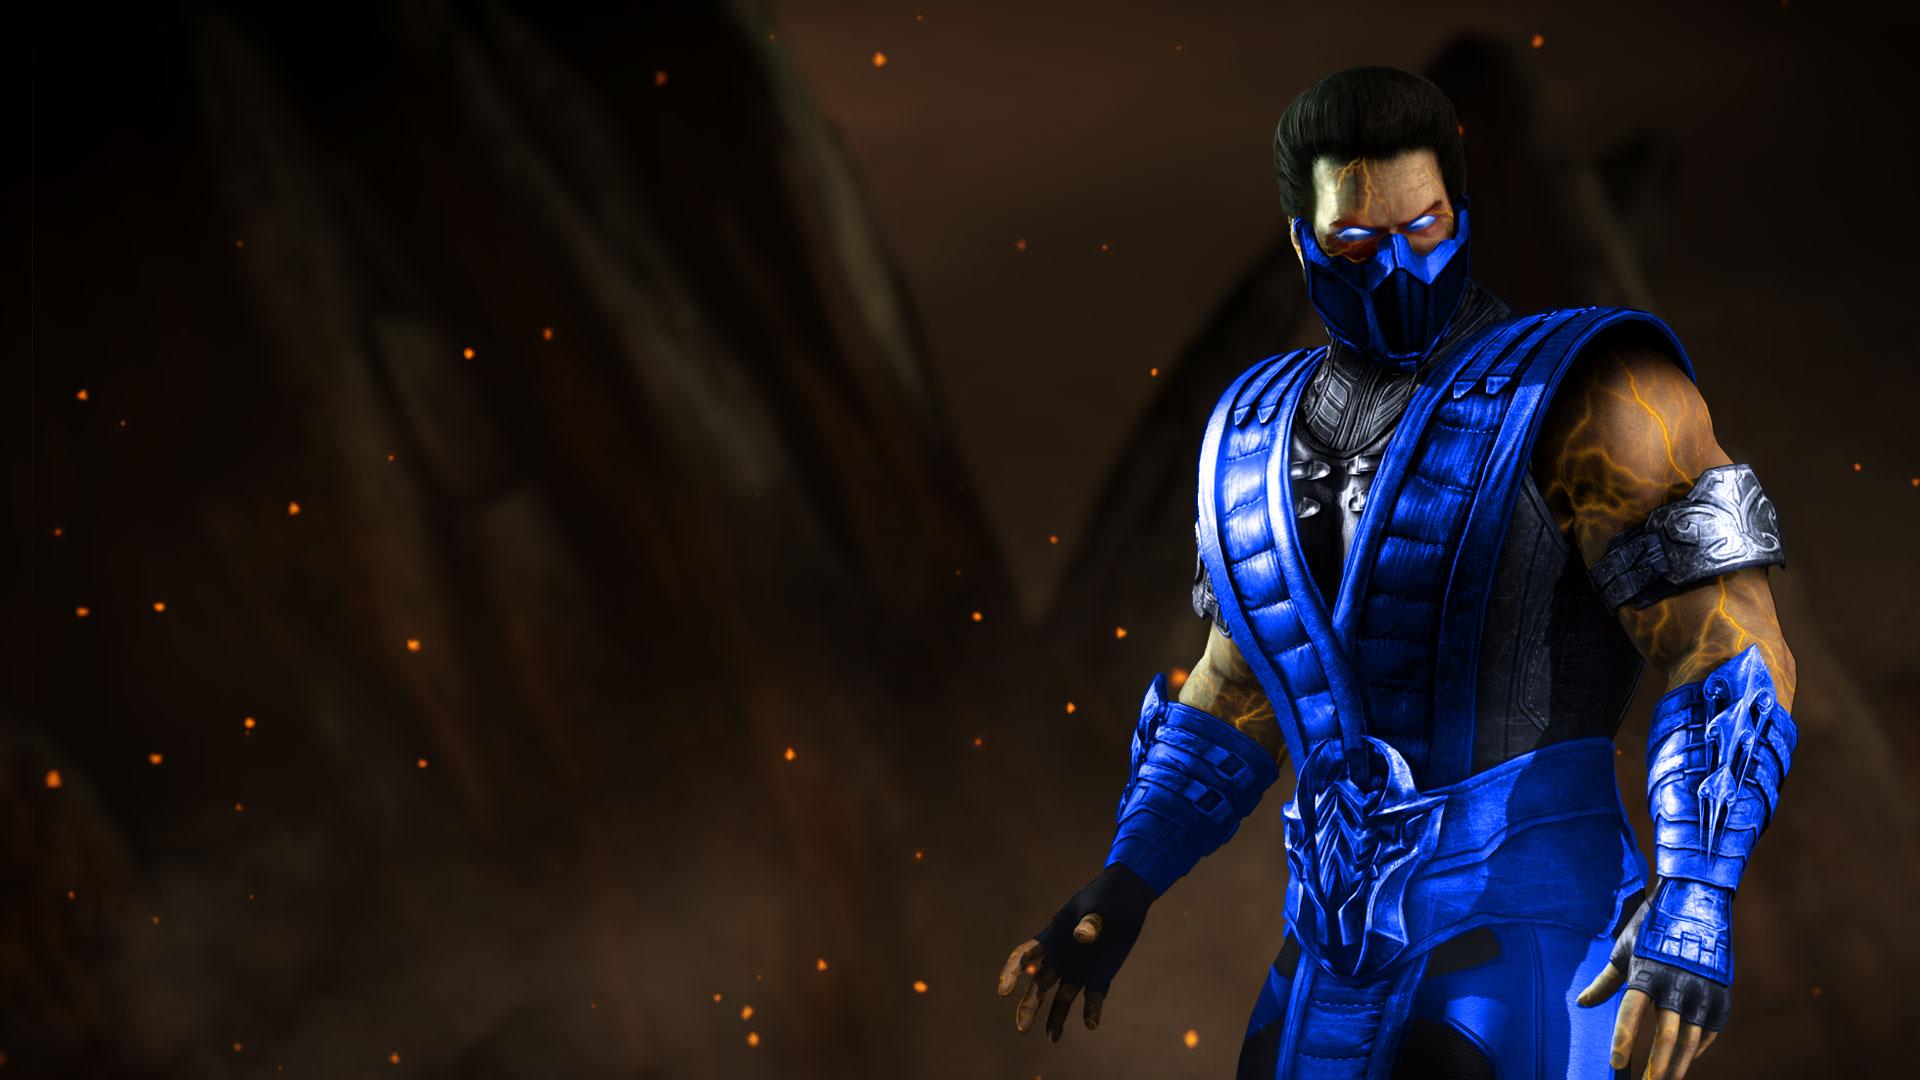 Hd Sub Zero Wallpapers Pixelstalk Mortal Kombat X Sub Zero